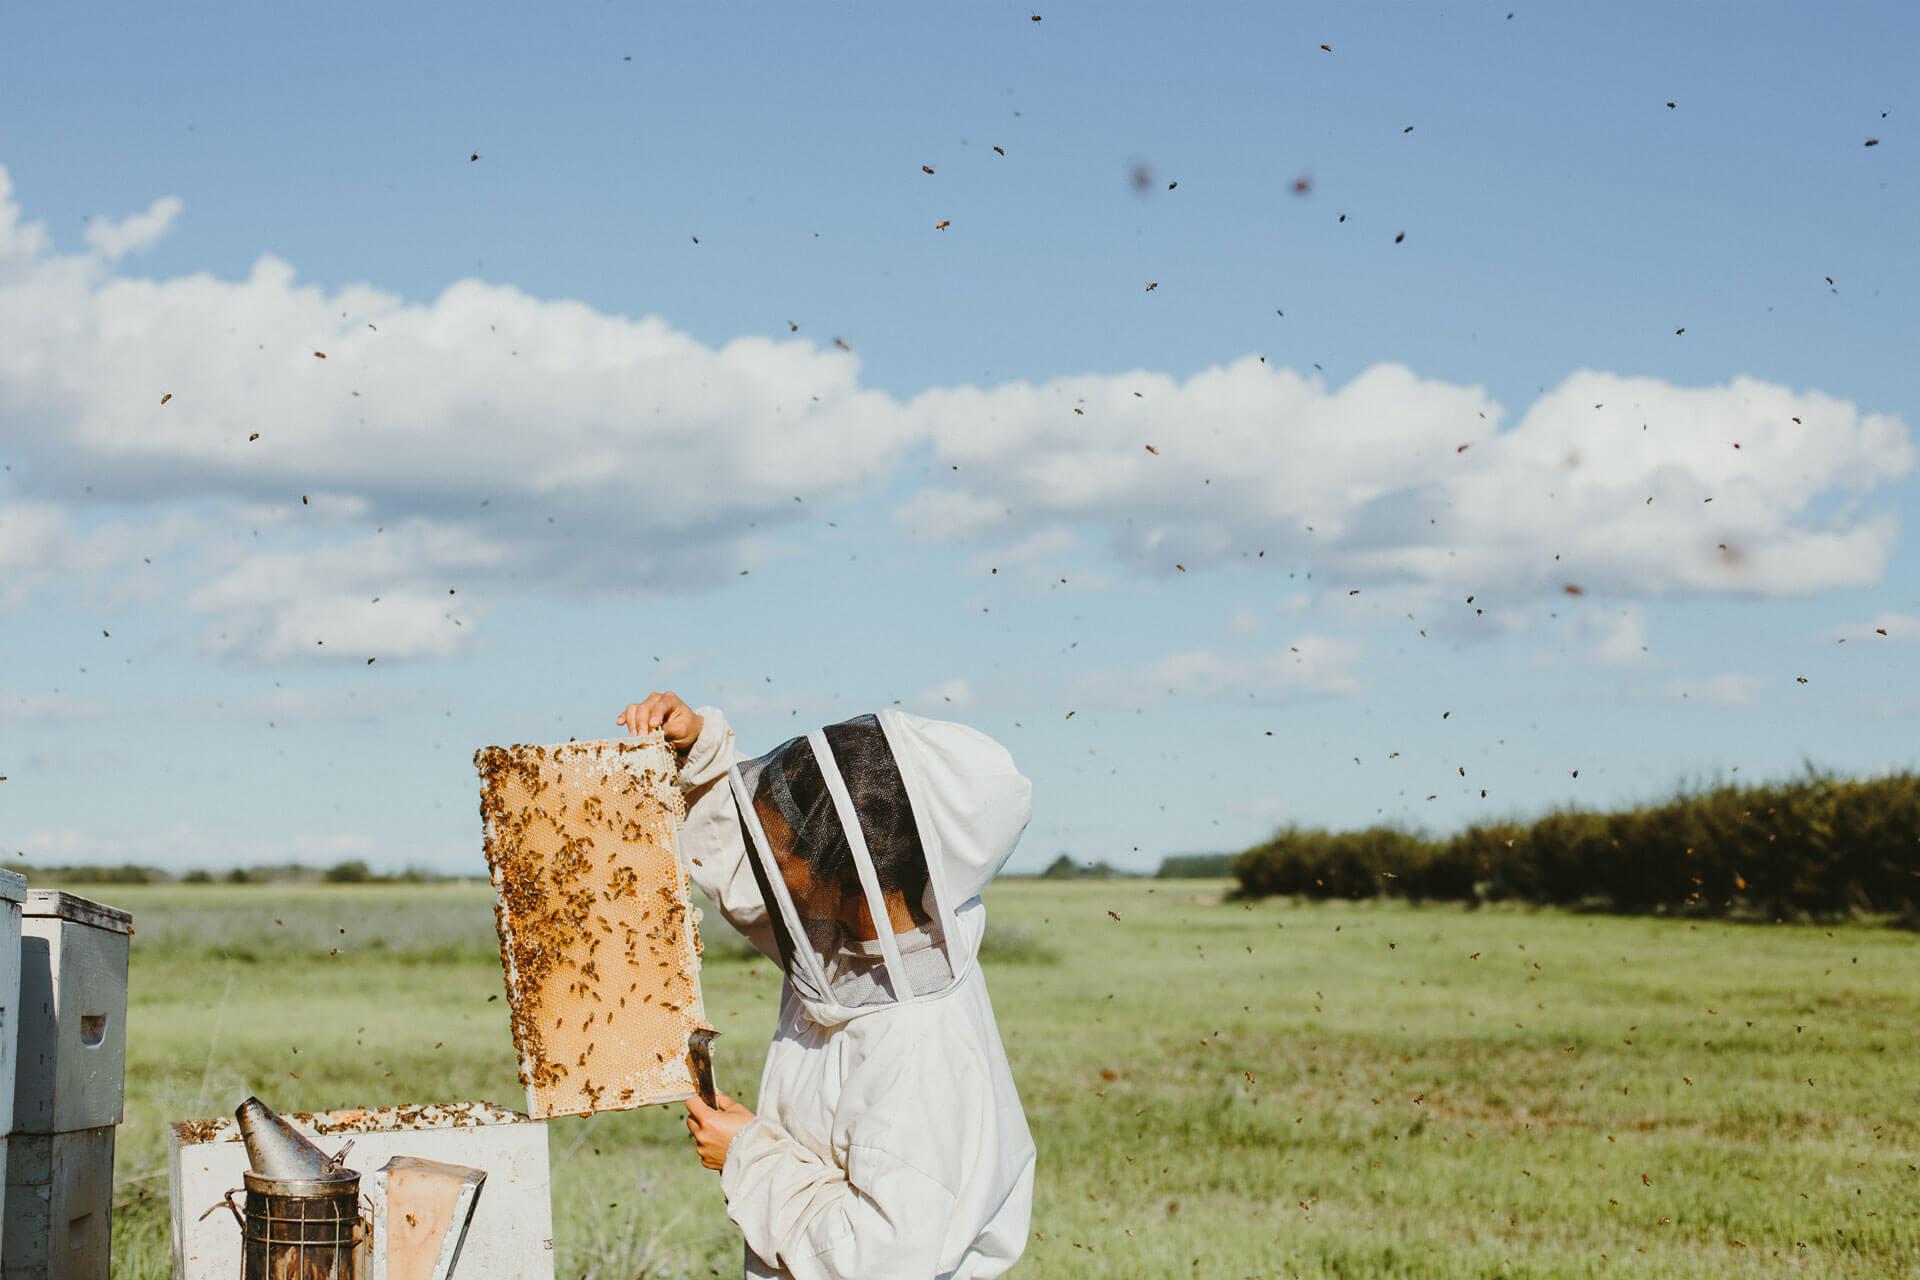 Our honey farm. Photo credit: Allison Seto.